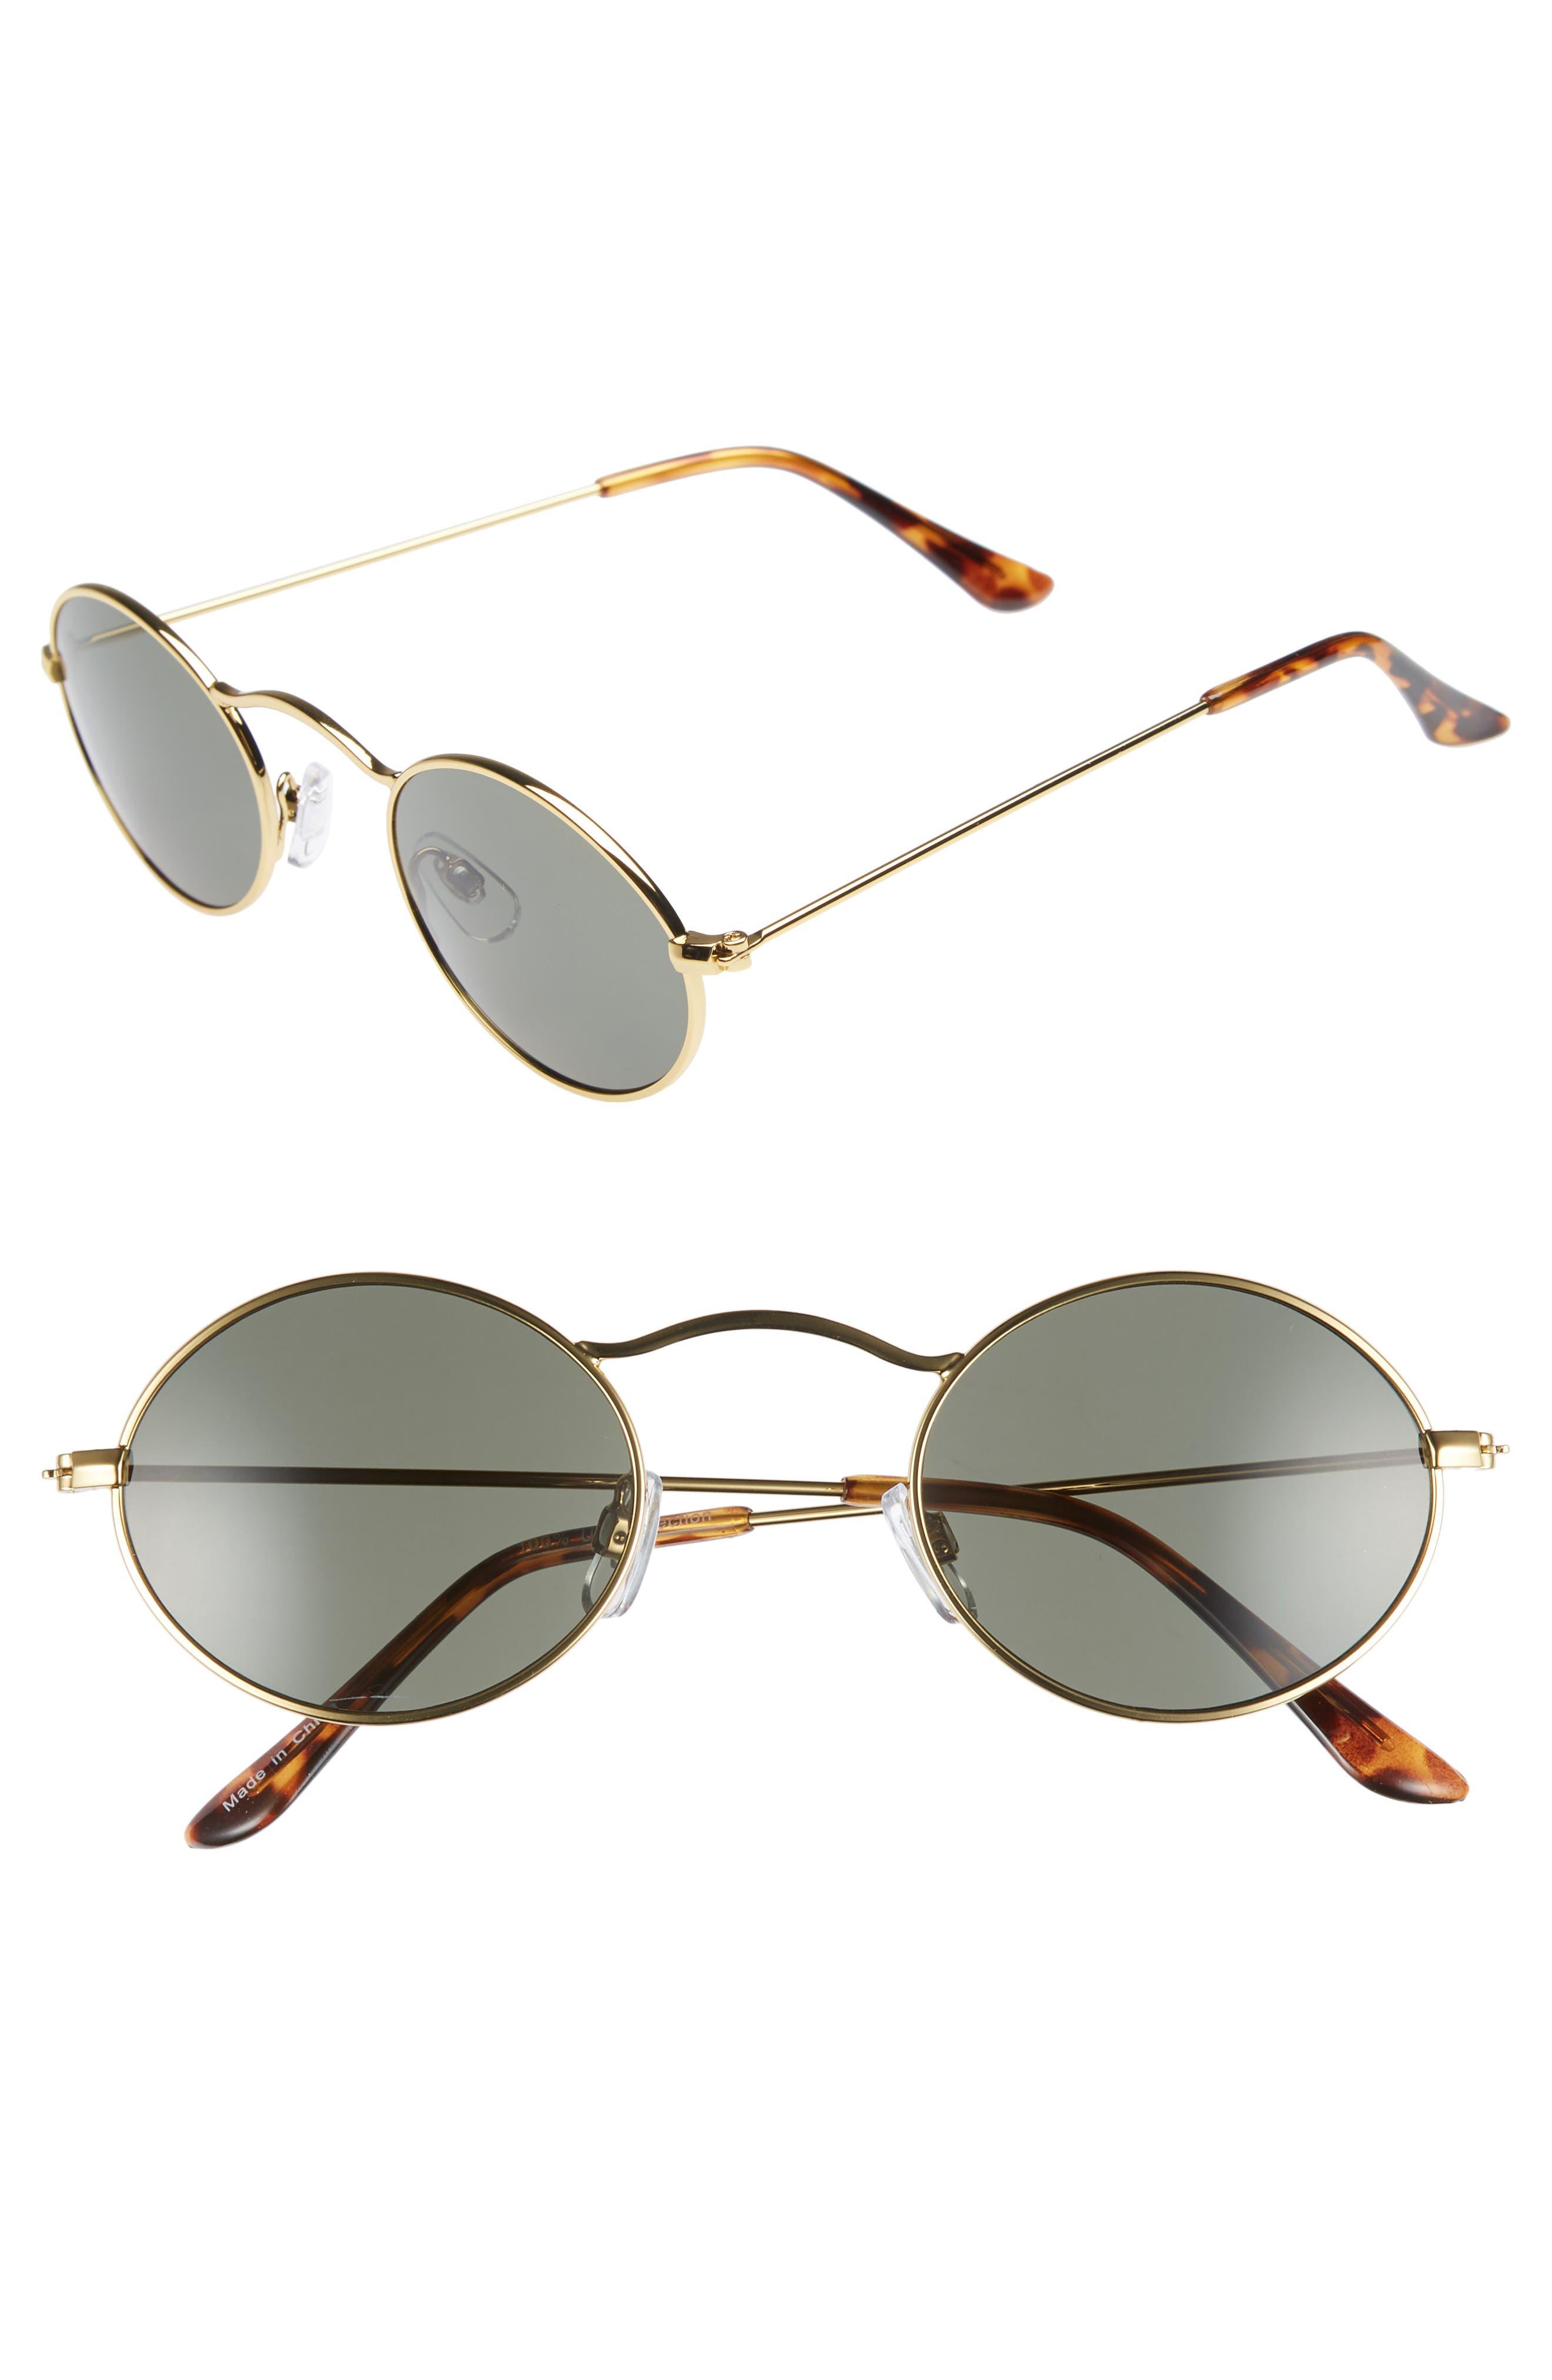 48mm Small Oval Sunglasses,                             Main thumbnail 1, color,                             GOLD/ BLACK